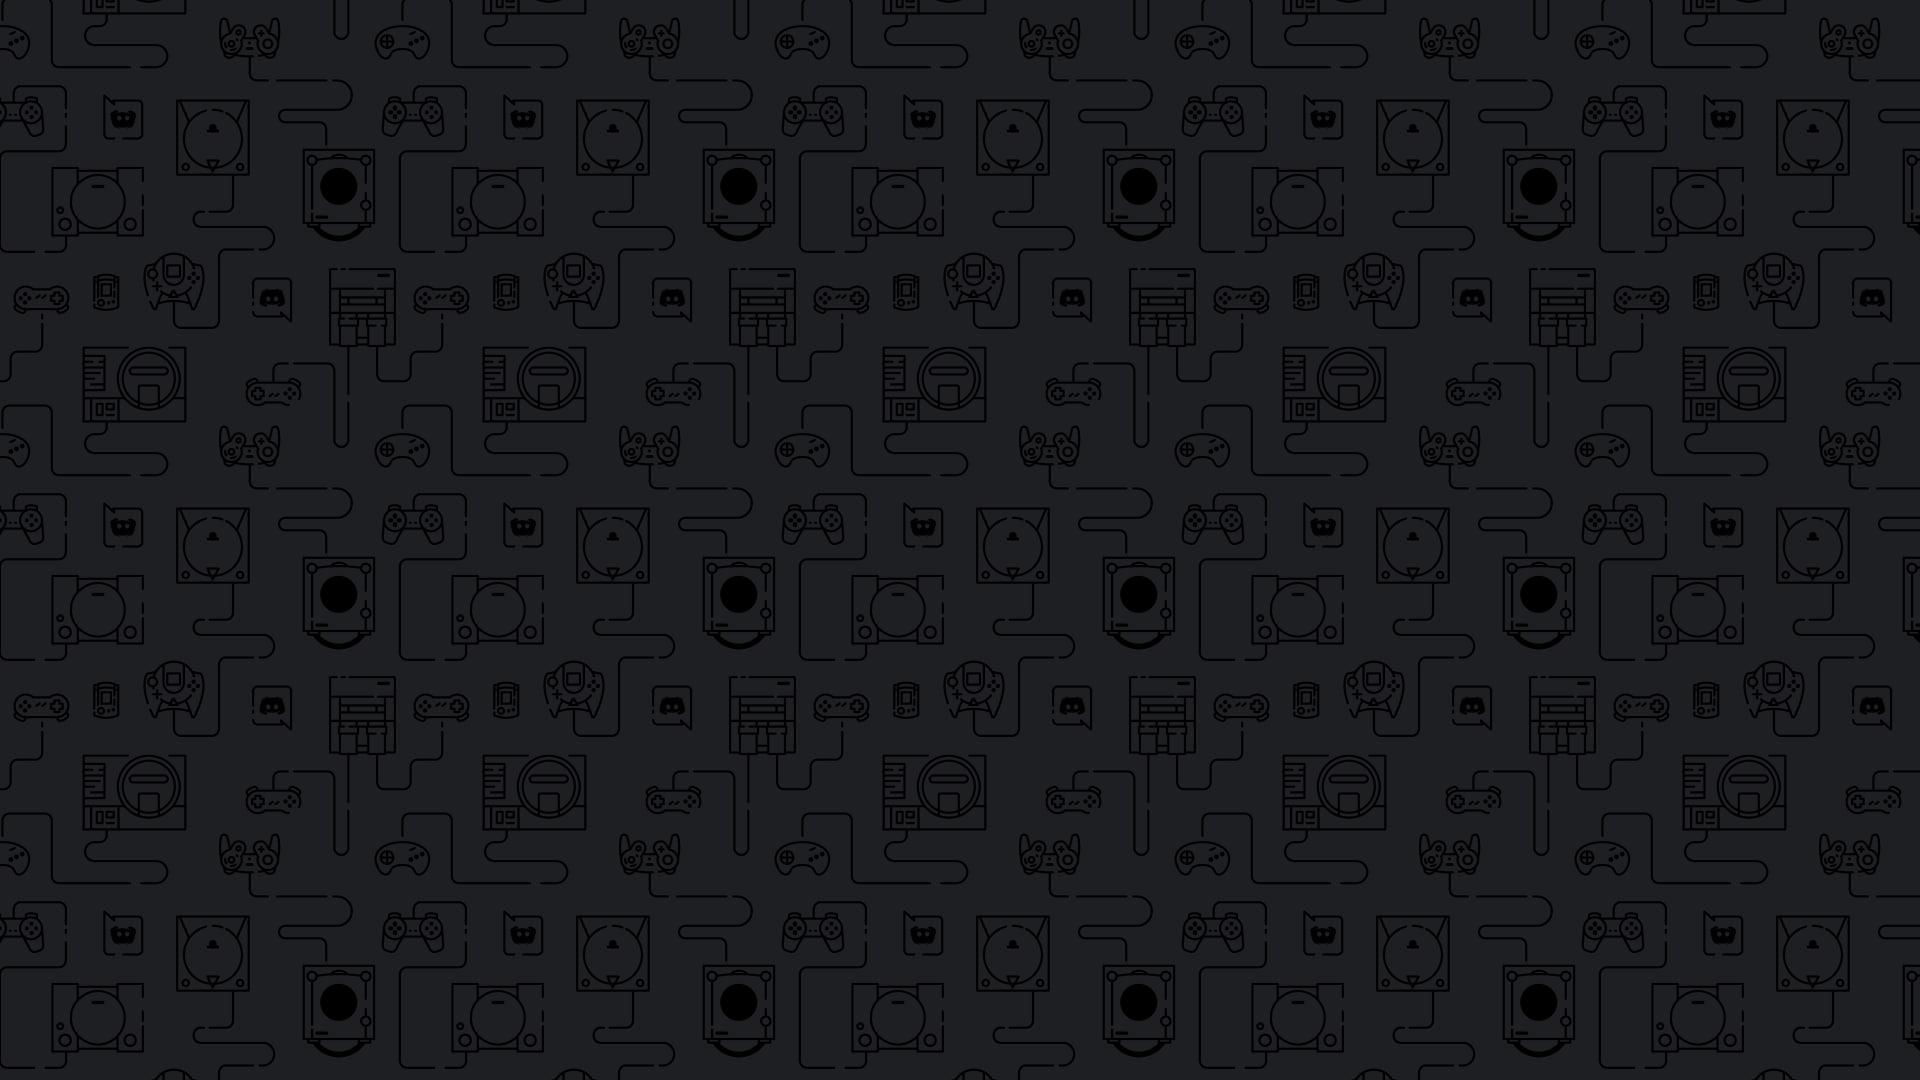 53 discord wallpaper on wallpapersafari 53 discord wallpaper on wallpapersafari